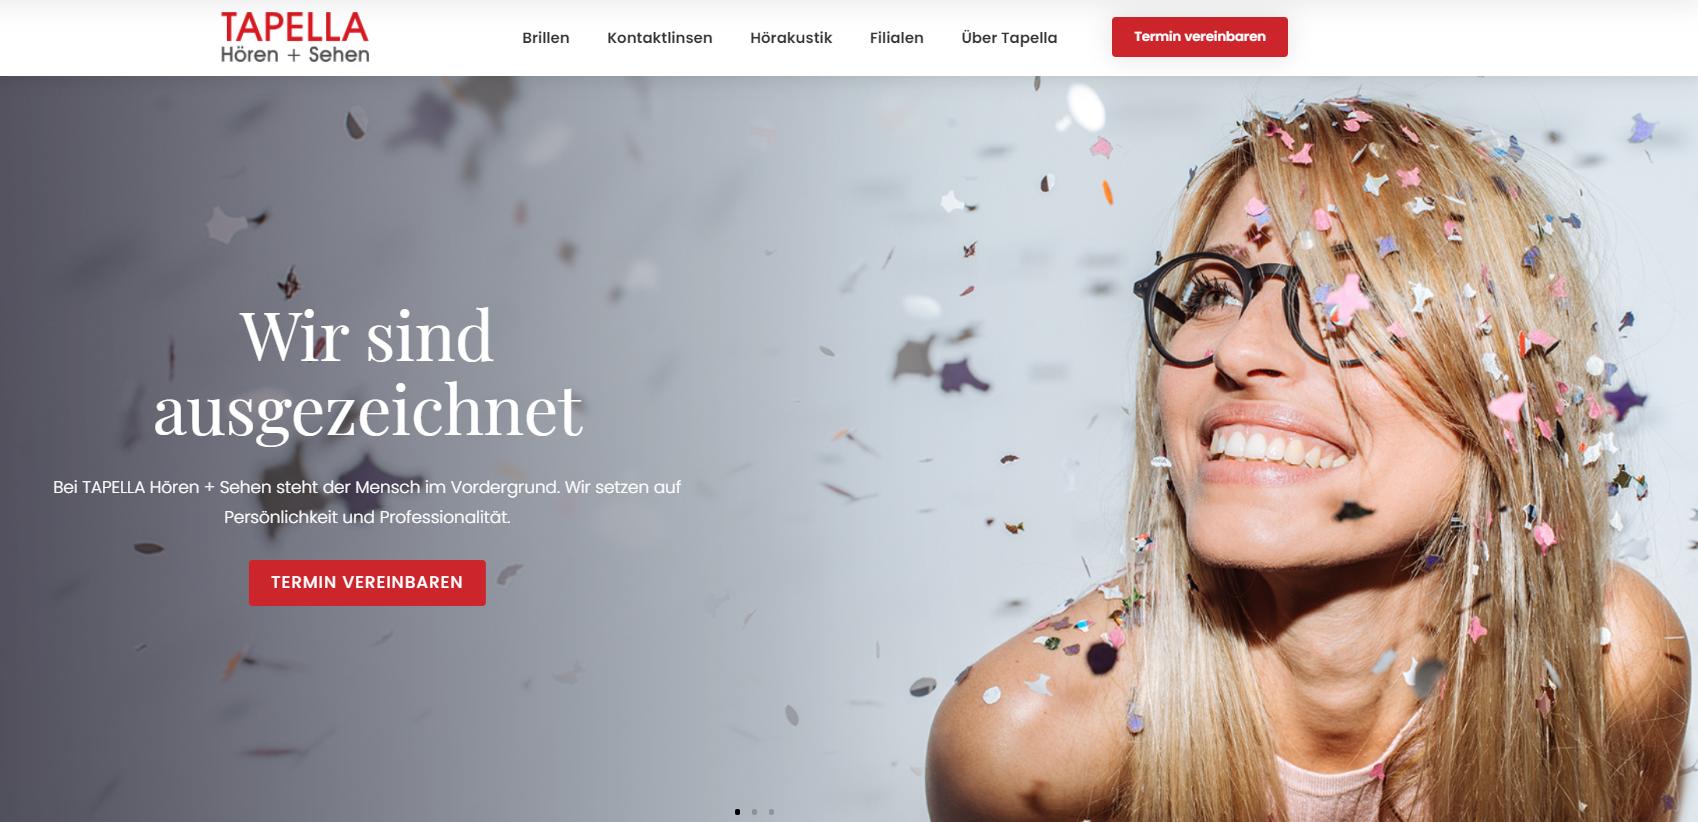 Tapella - Leadorientierte Marken-Website